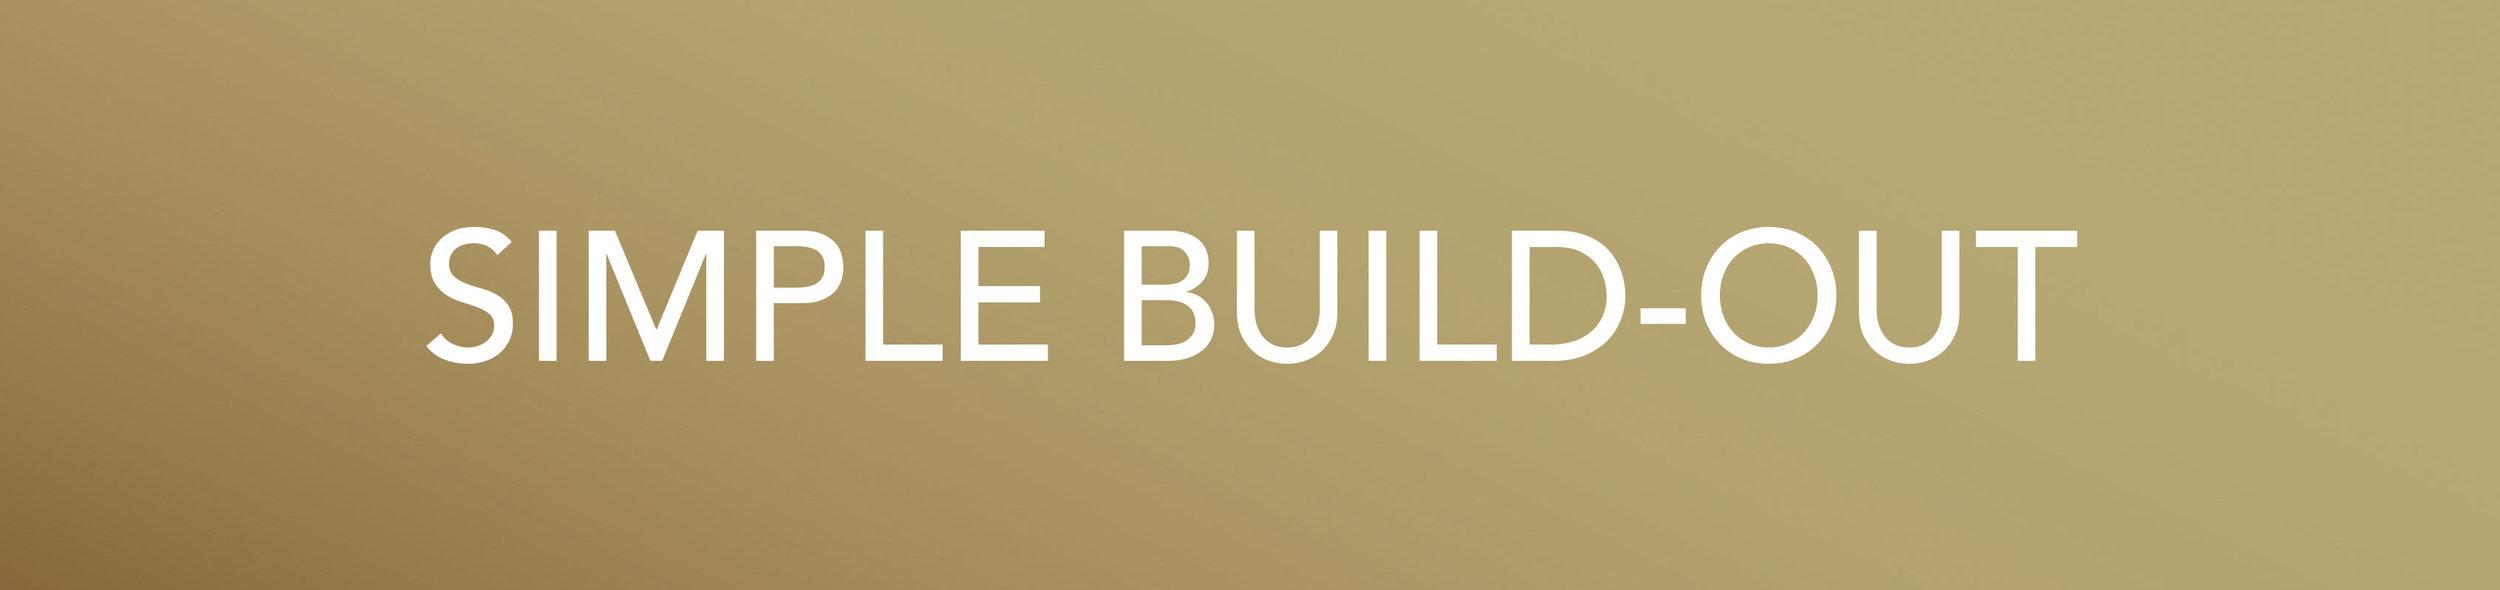 simple_buildout.jpg